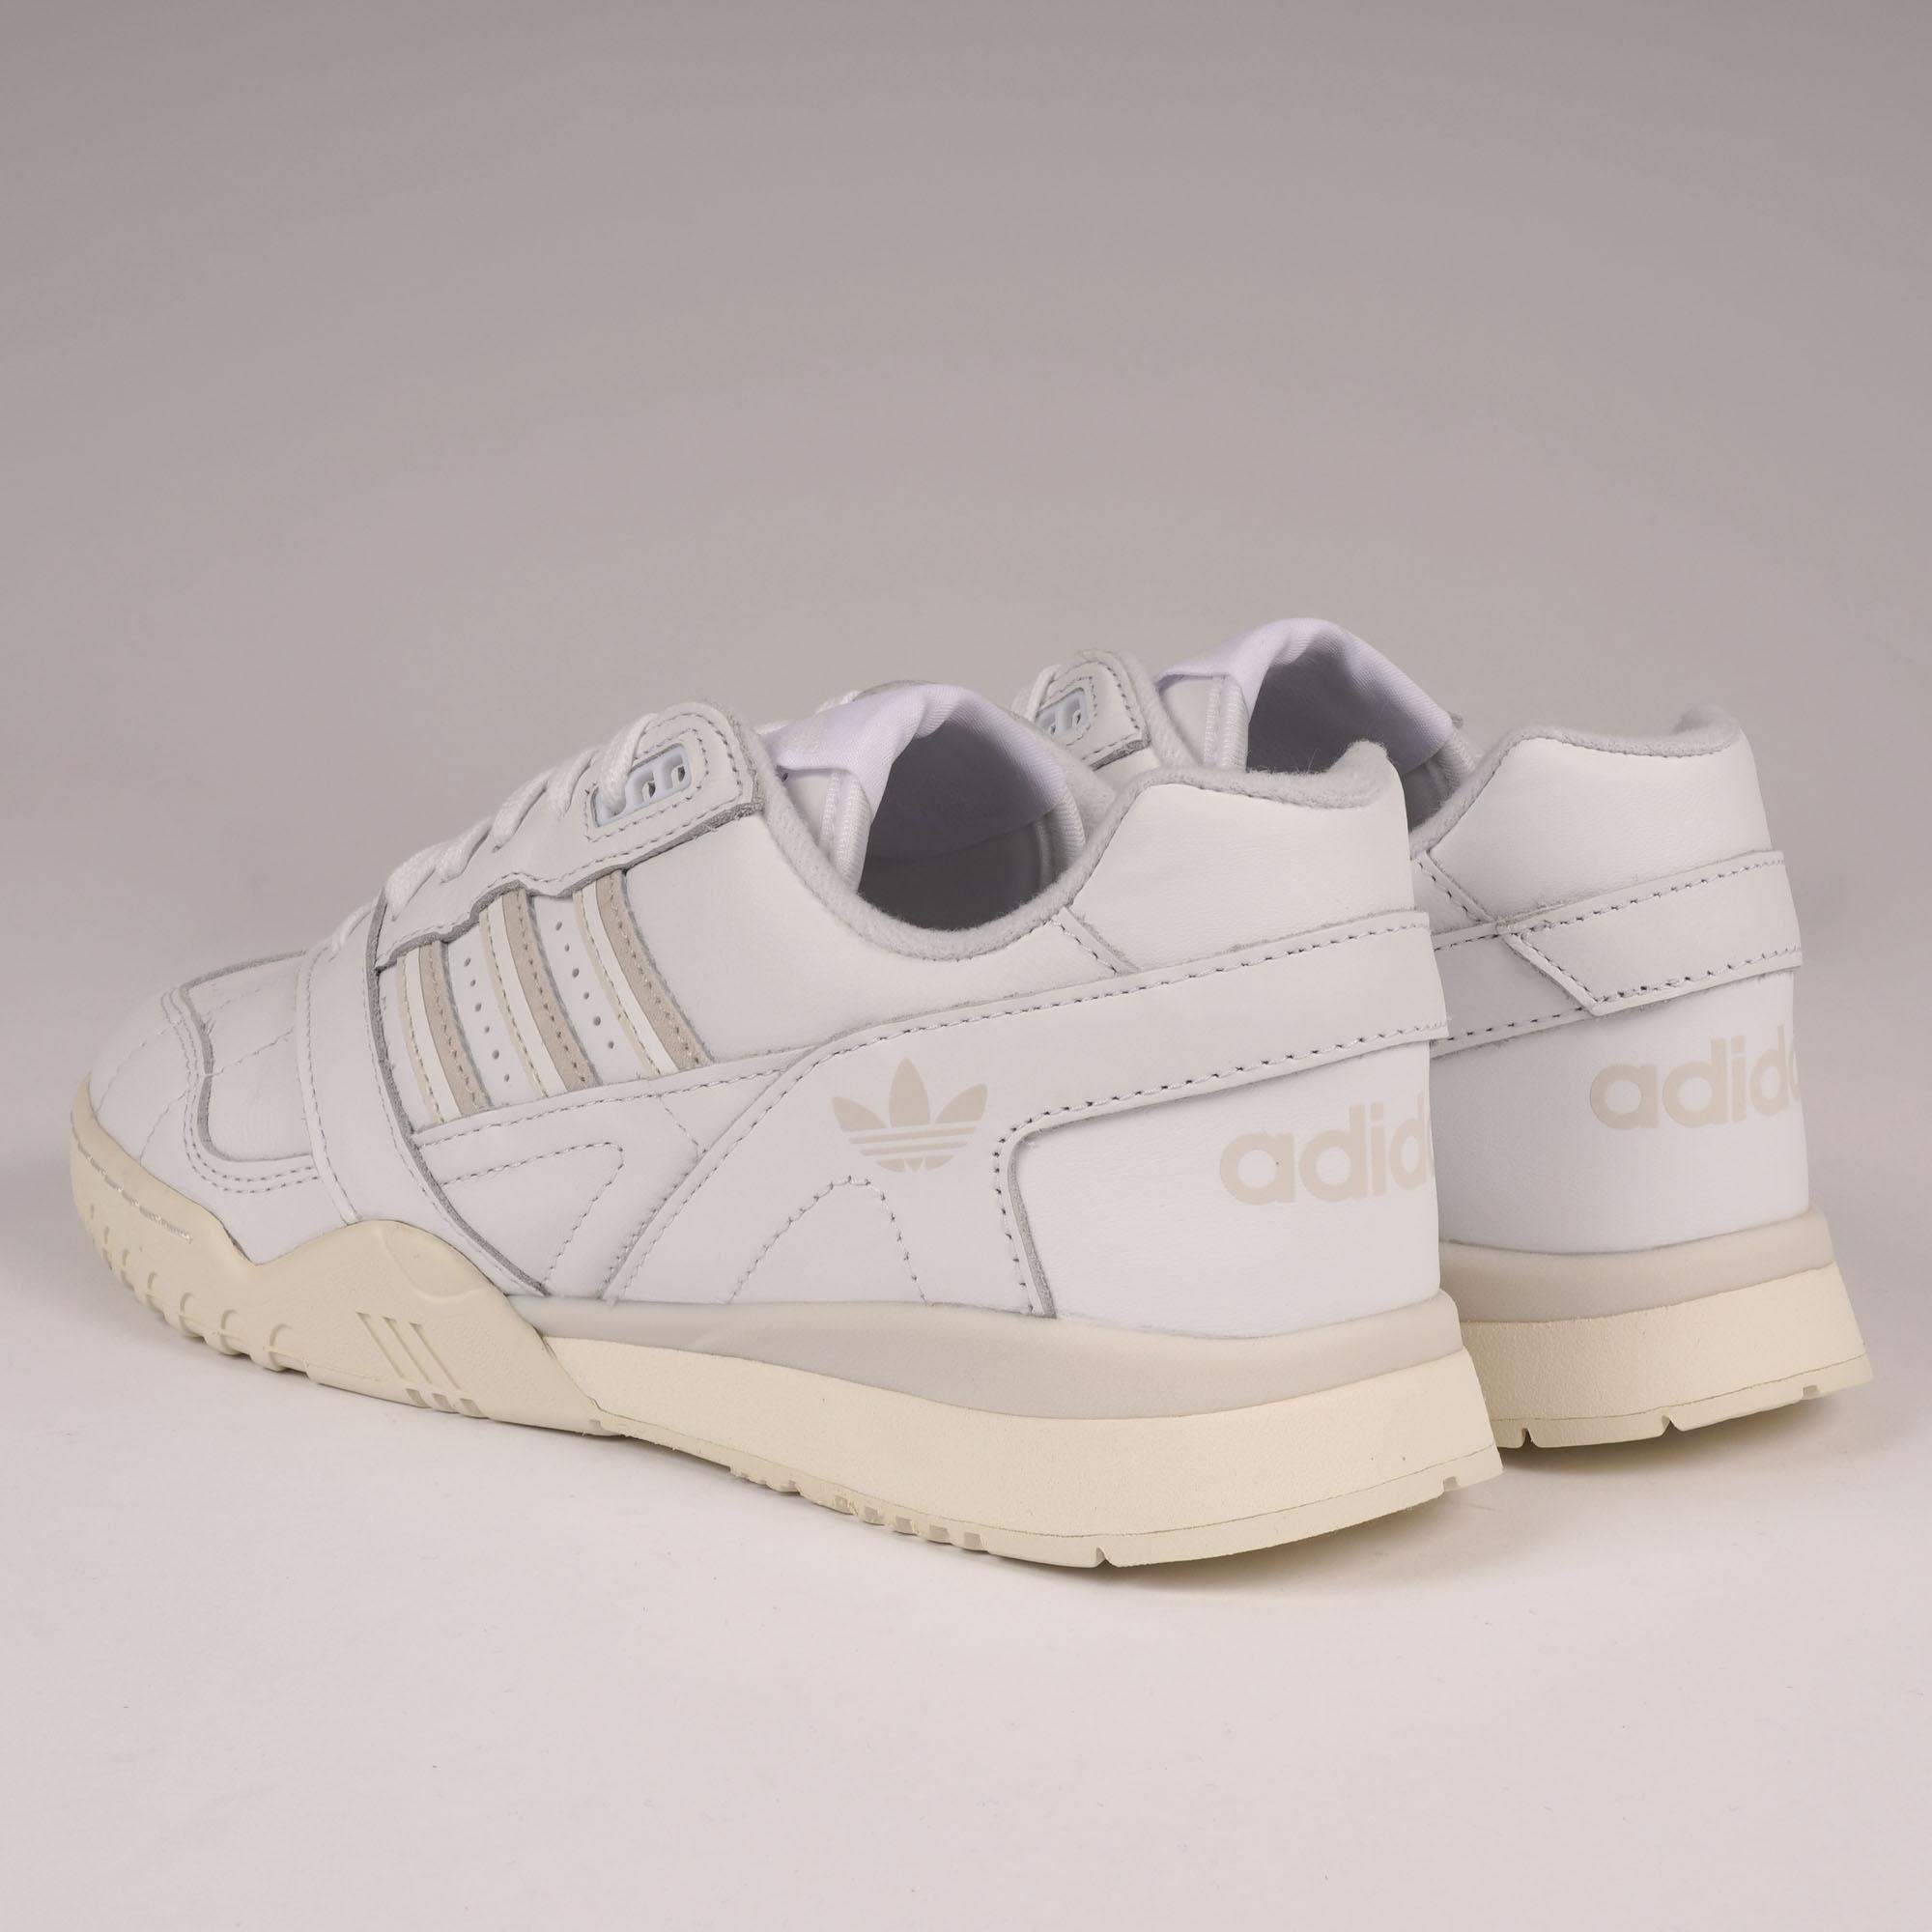 online retailer 06d55 63b3d Adidas Originals - Multicolor A.r. Trainer for Men - Lyst. View fullscreen